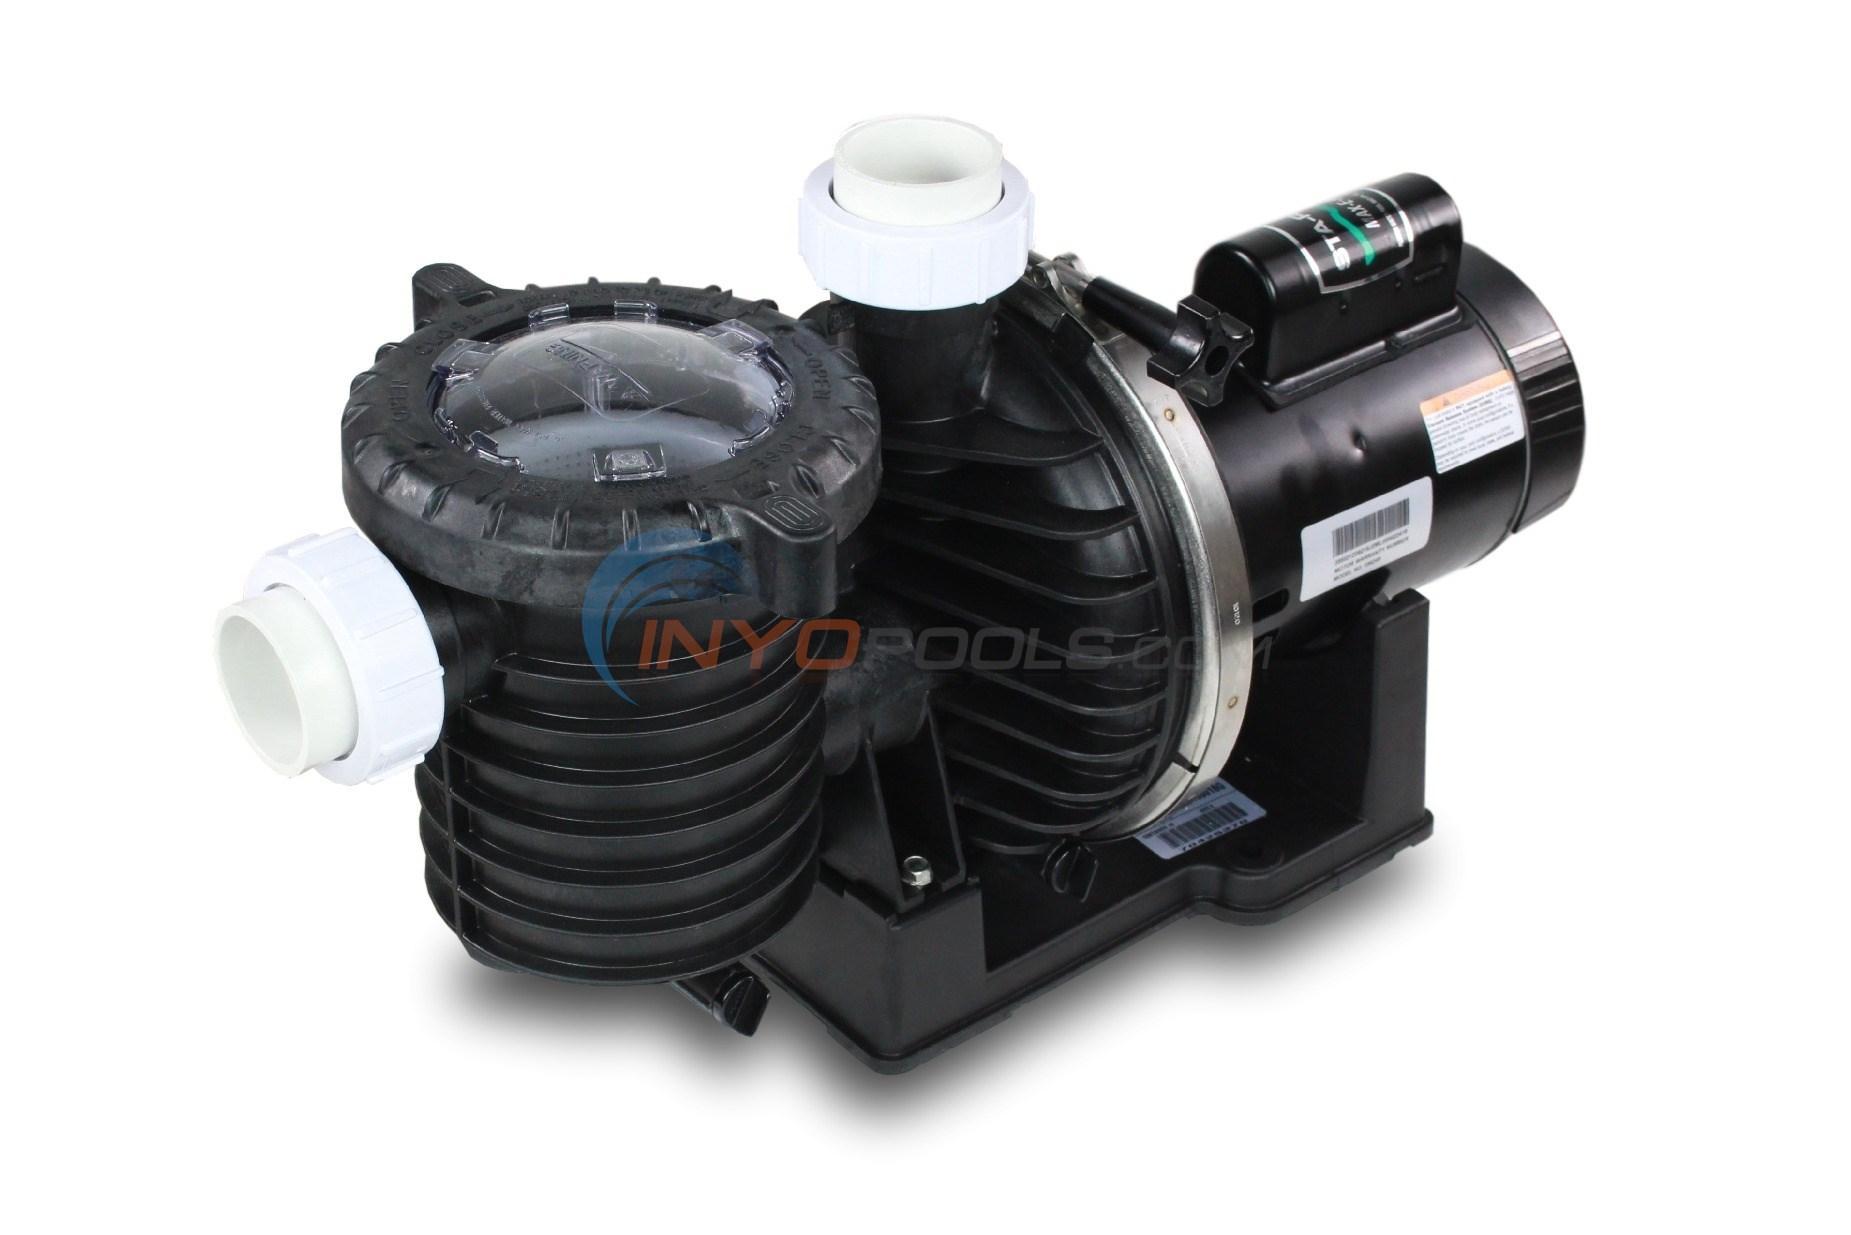 Smith jones motors 2 hp wiring diagram 2 hp motor current for 2 hp motor current